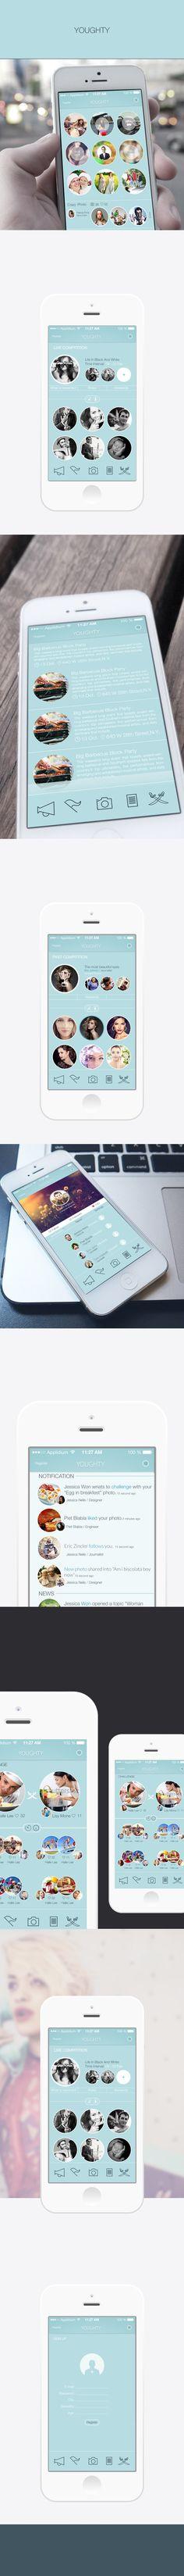 Yougthy App Concept I by enes kırdemir, via Behance